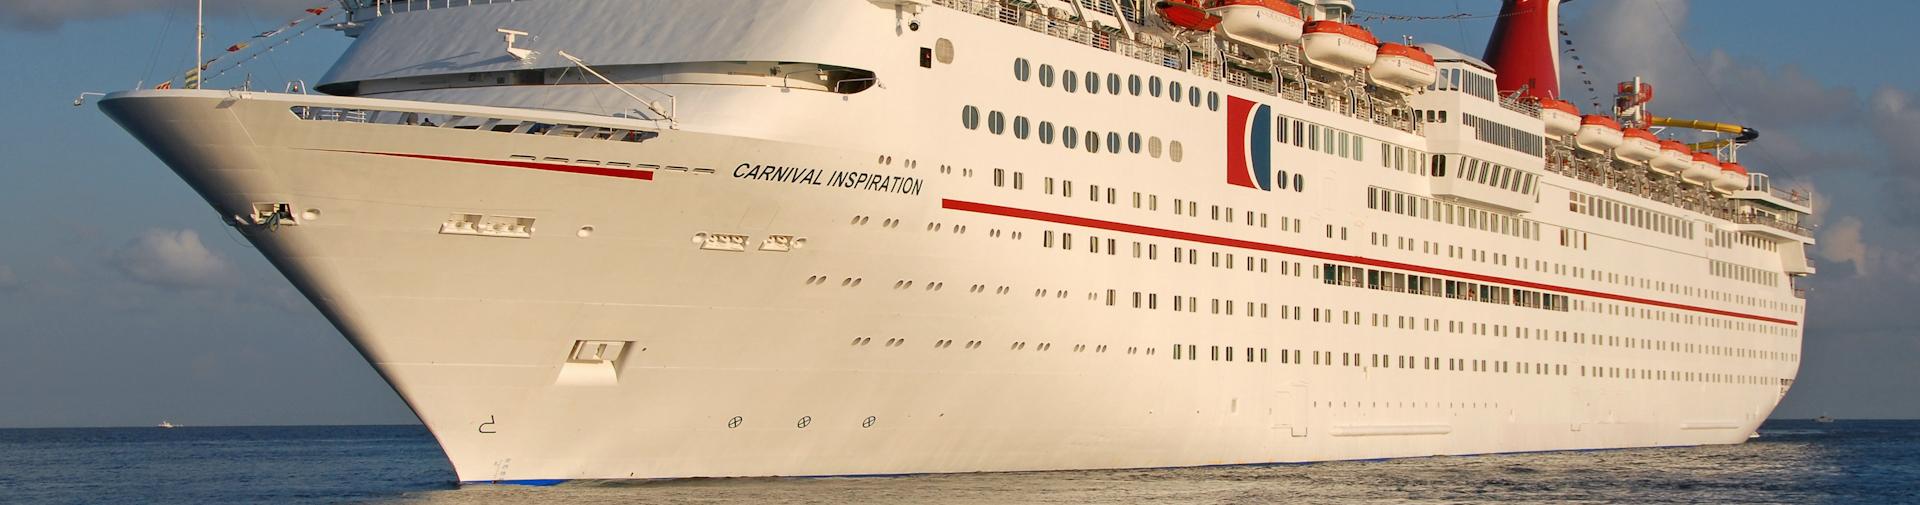 Carnival Inspiration bei hochseereise.de